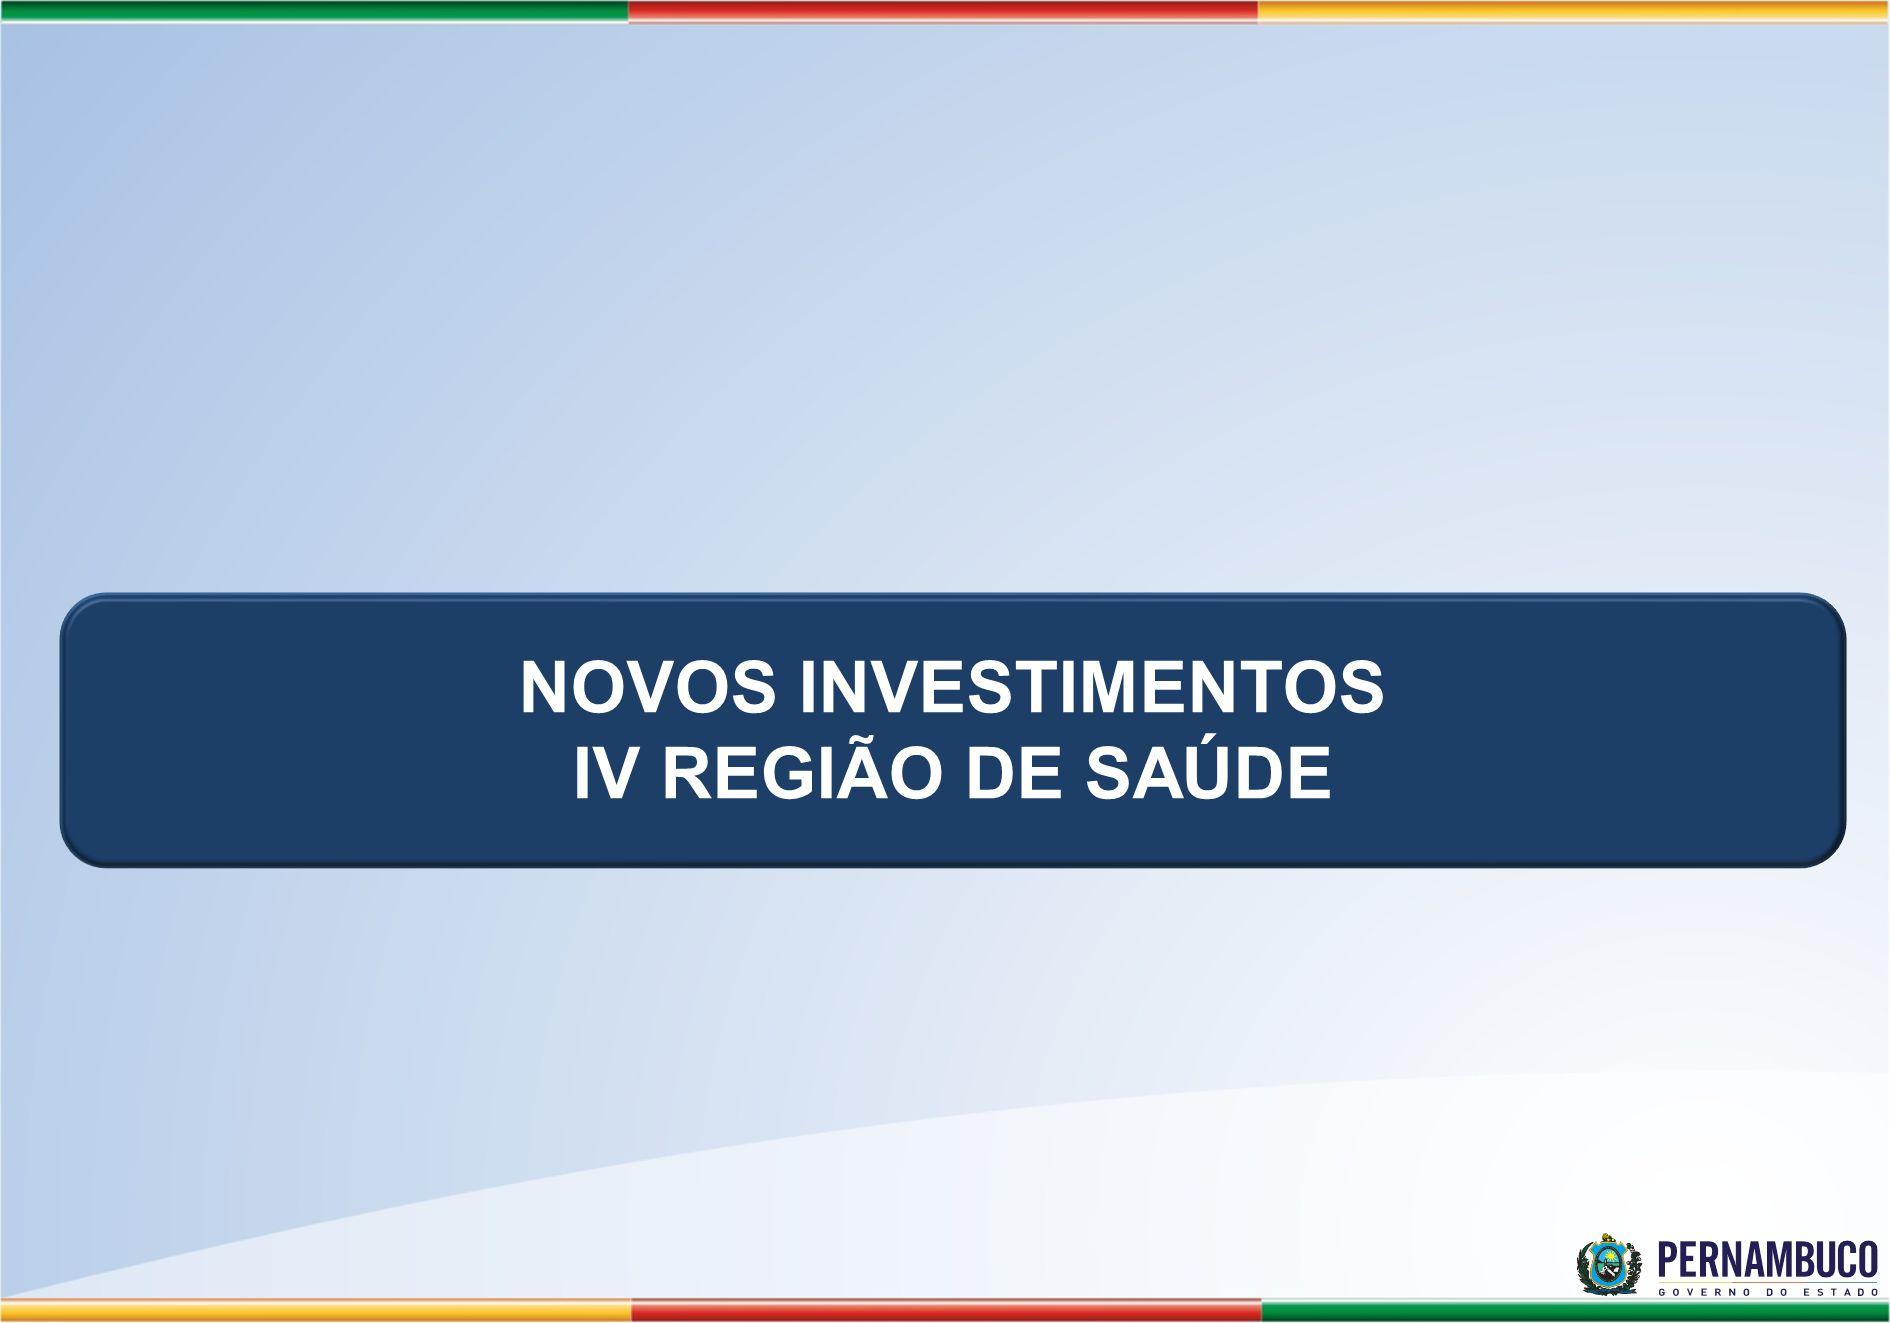 UPAE Caruaru Investimento R$ 22.656.322,04 Obra: R$ 14.456.322,04 Equipamentos R$ 8.200.000,00